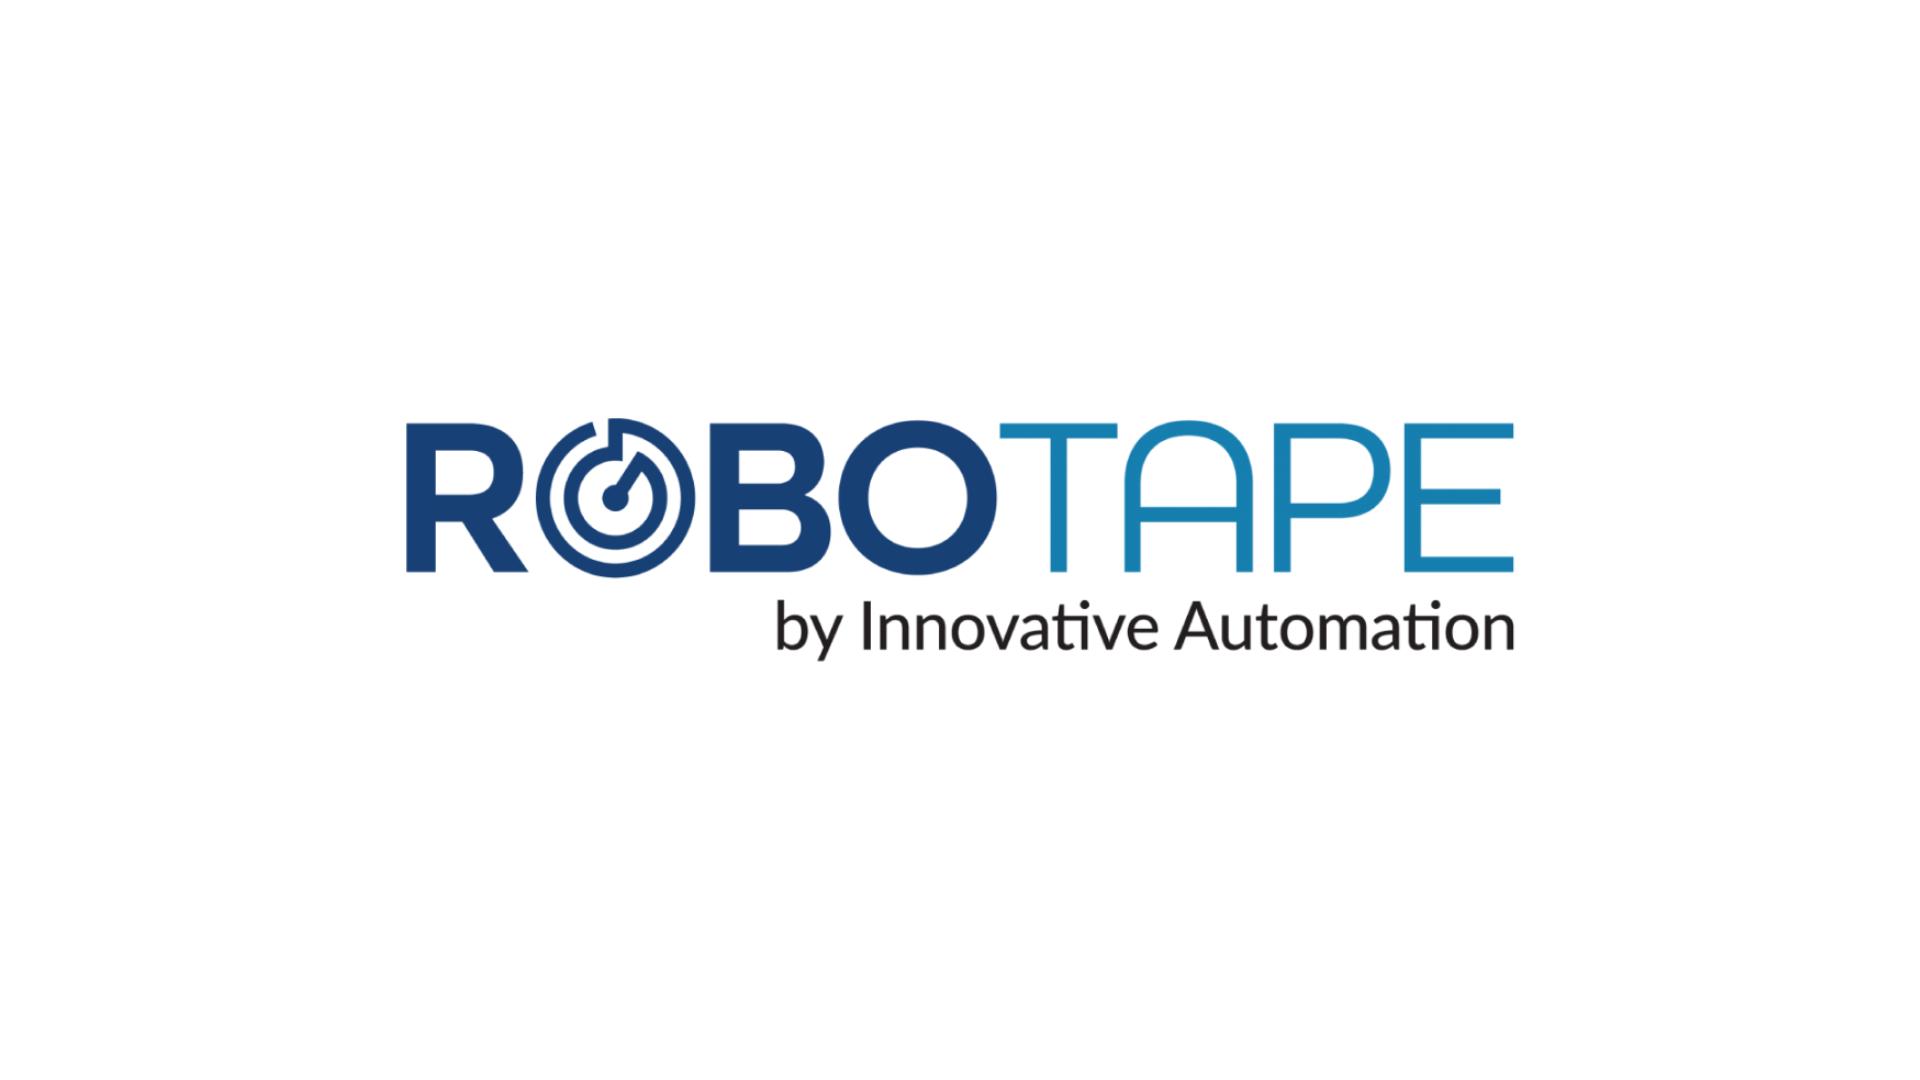 https://xceleratesummit.co/wp-content/uploads/2021/09/Robotape-1.png